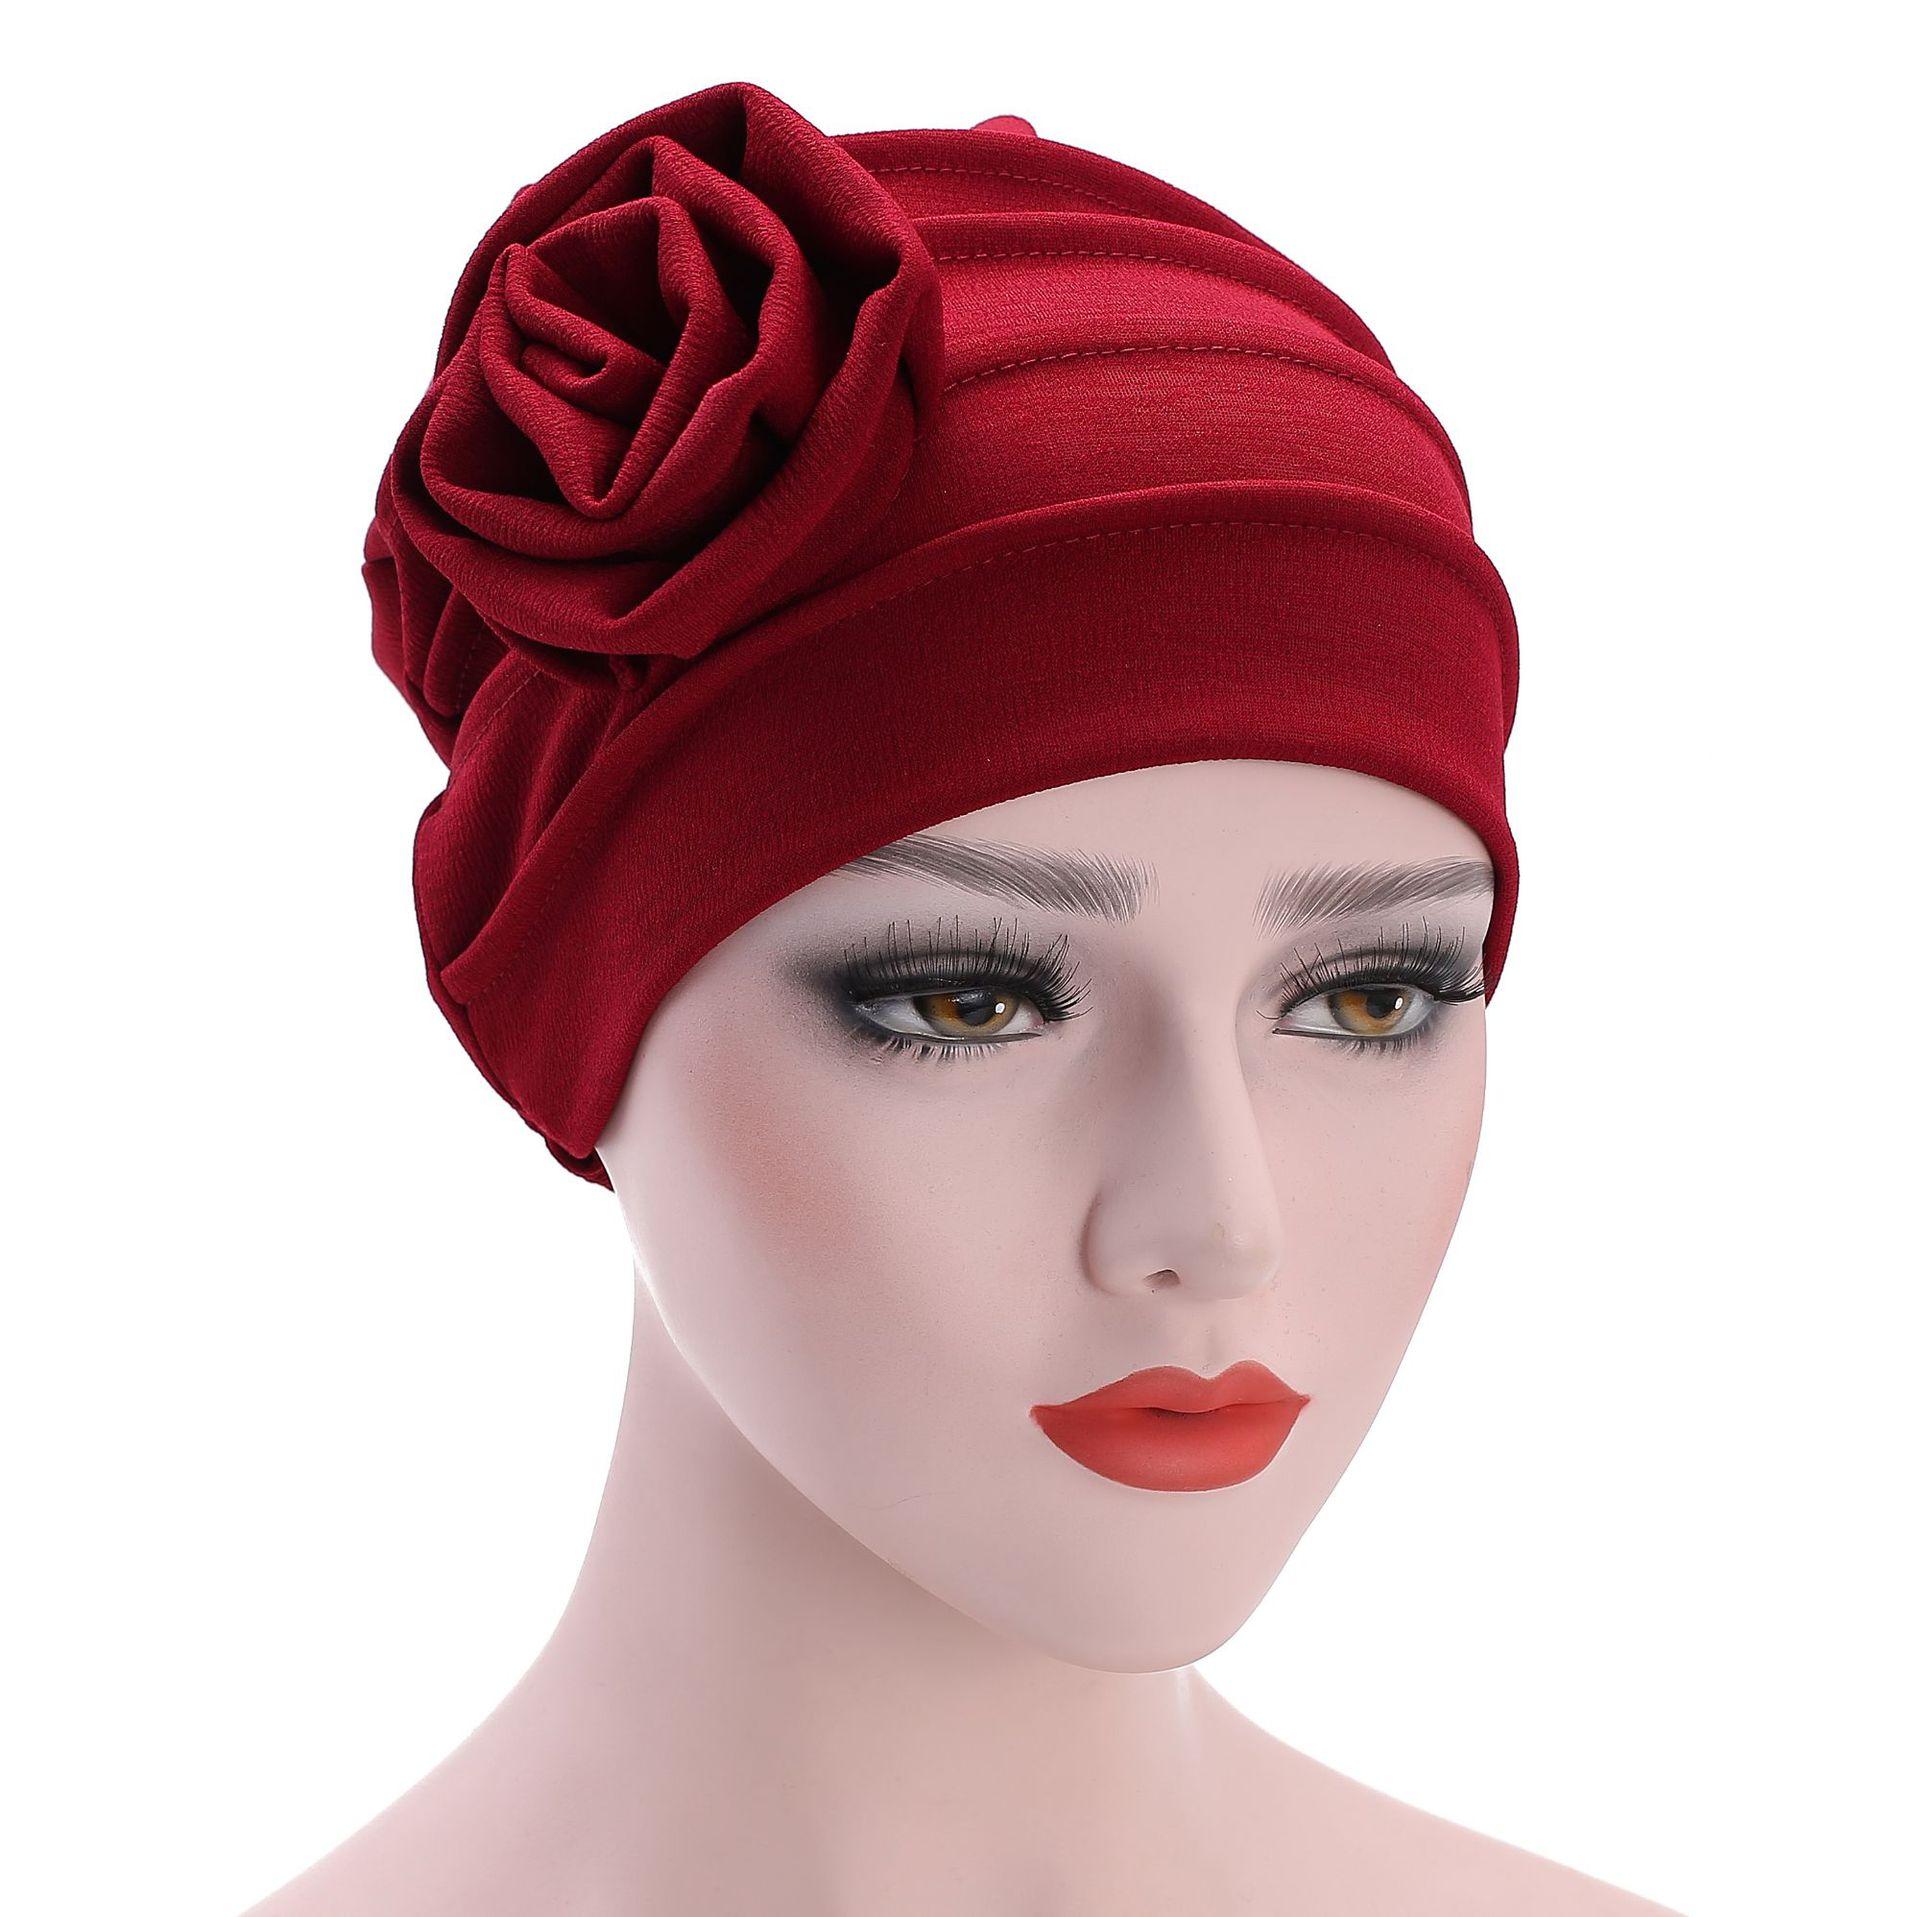 Flower Islamic Clothing Muslim Hijab Inner Caps Beanie Cancel Sleep Turban Hat Bonnet African For Women